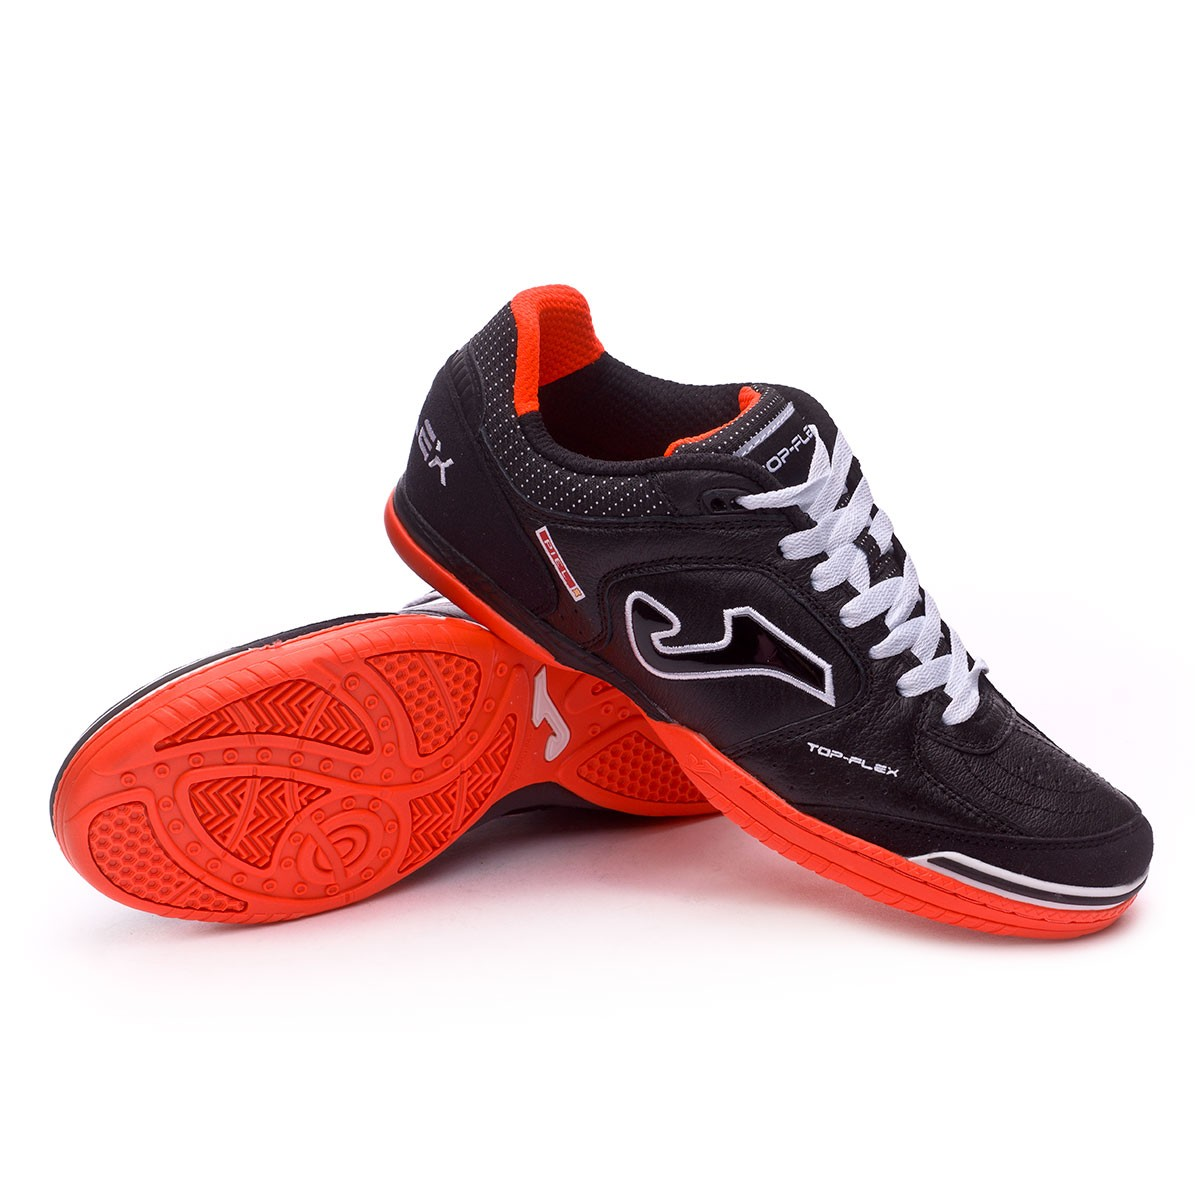 ... Zapatilla Top Flex Negro. CATEGORY. Futsal · Futsal boots · Joma 113d9997c01b6